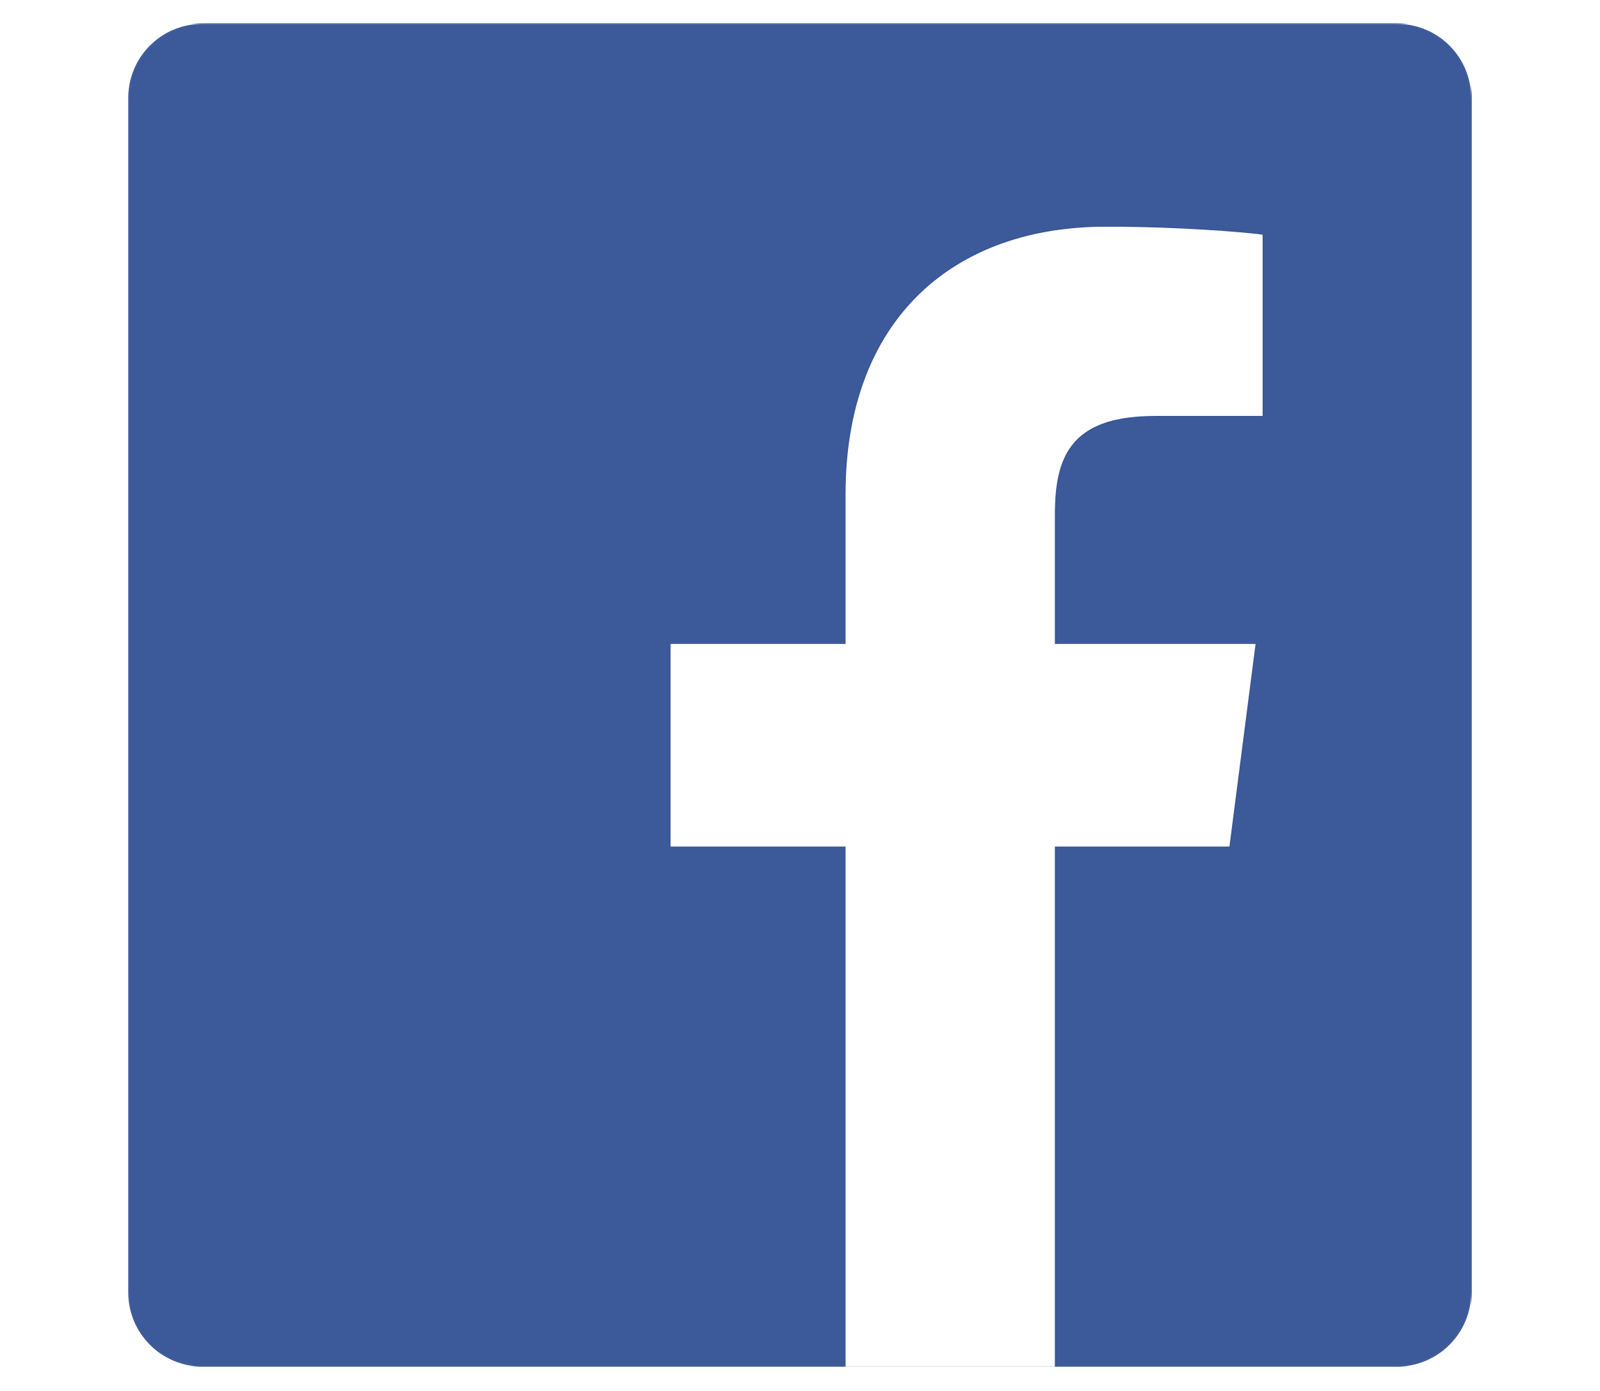 Le-logo-Facebook - Ville de Saint-Gobain